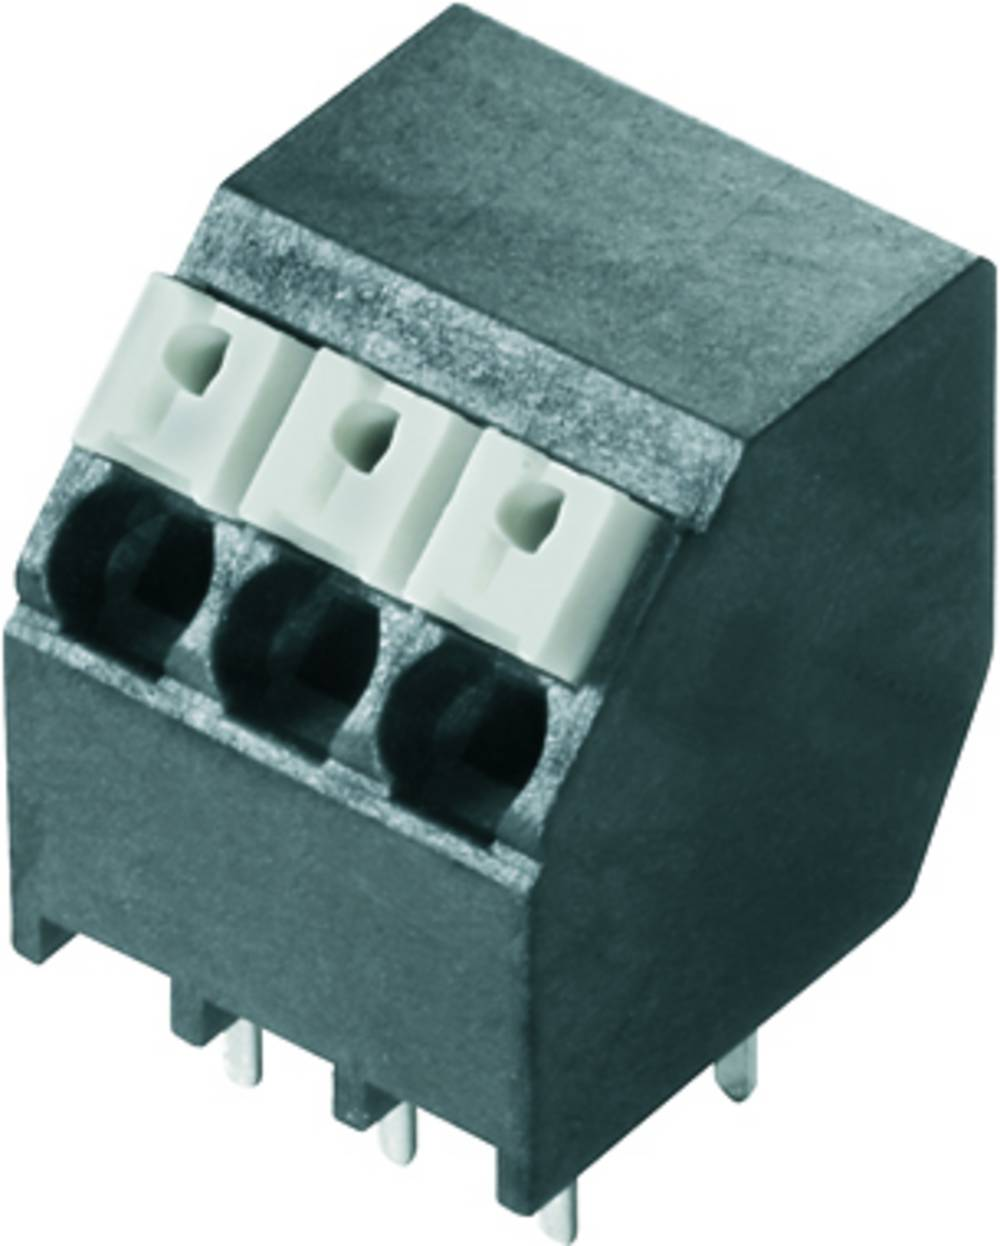 Fjederkraftsklemmeblok Weidmüller LSF-SMT 3.81/11/135 1.5SN BK TU 1.50 mm² Poltal 11 Sort 13 stk